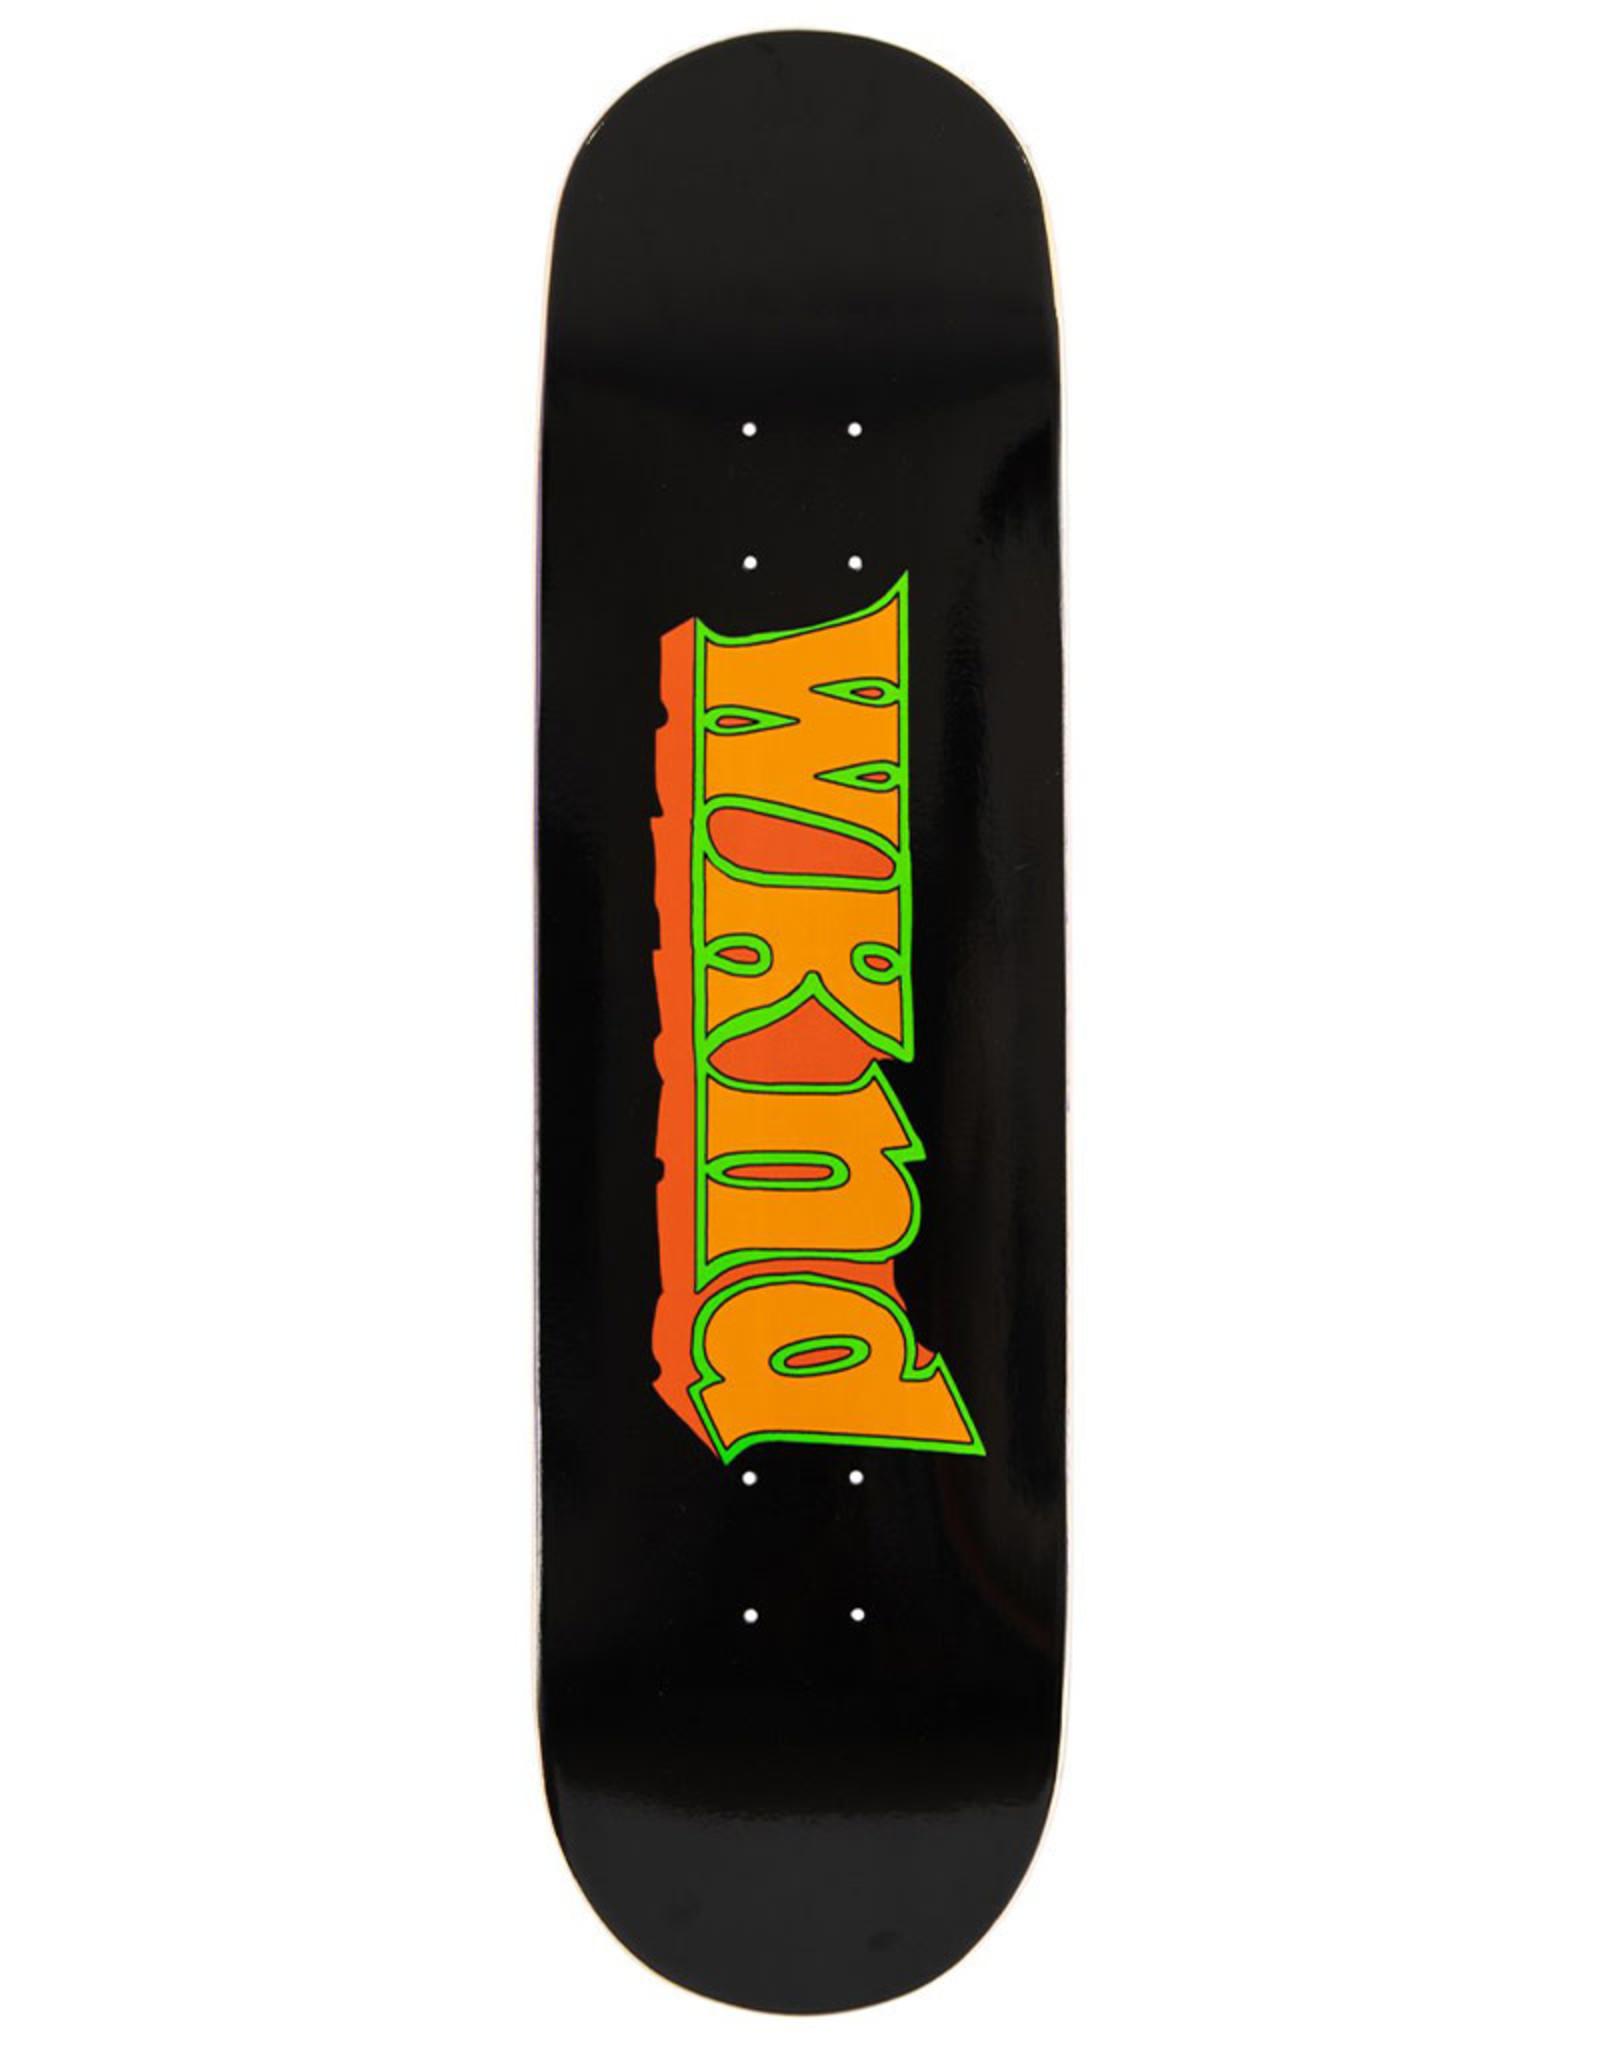 Wknd Skateboards Wknd Deck Team Good Times Black (8.25)